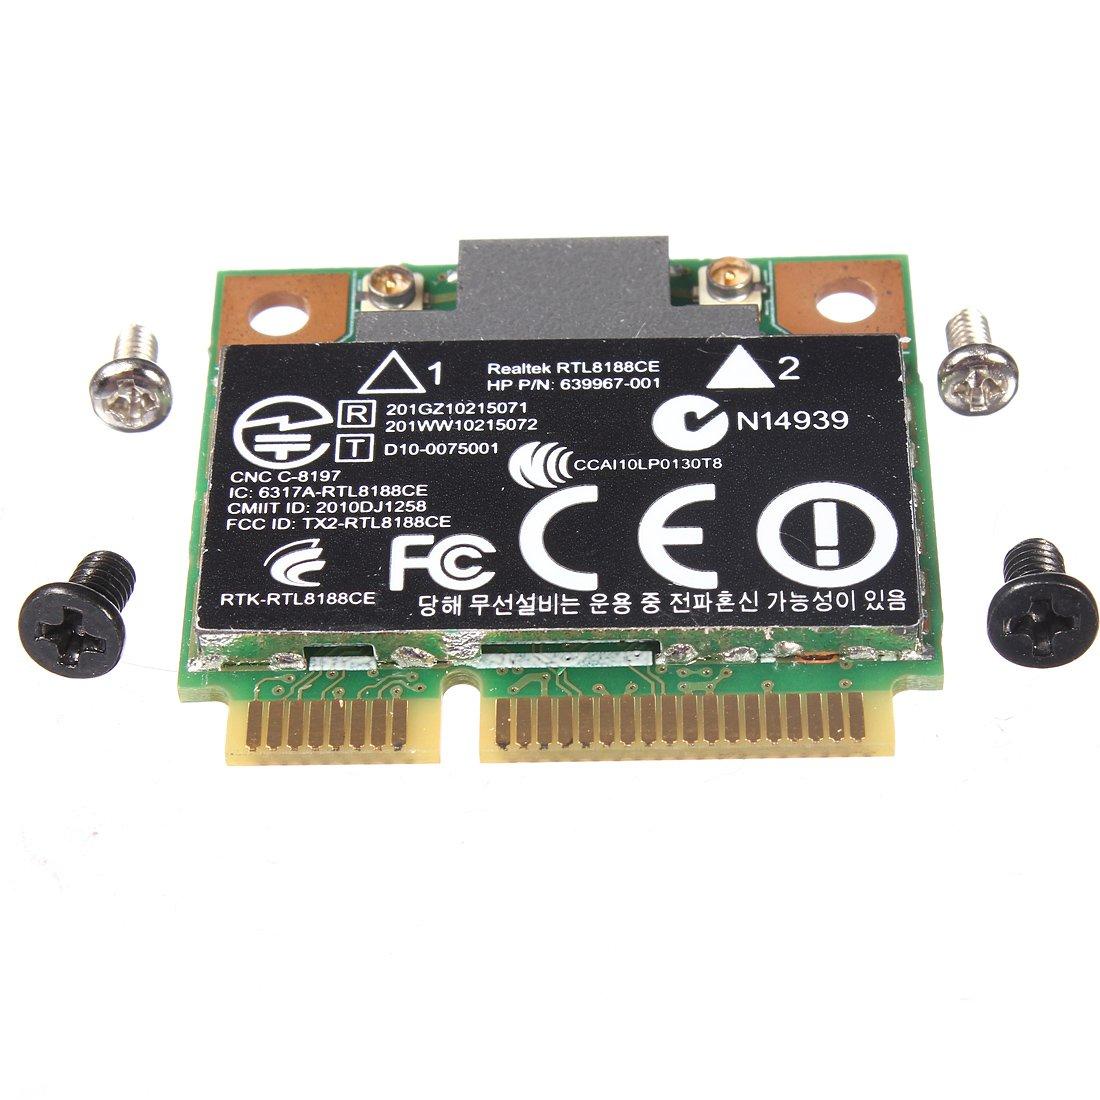 HP G60-531NR Notebook Broadcom WLAN Driver for Windows Download